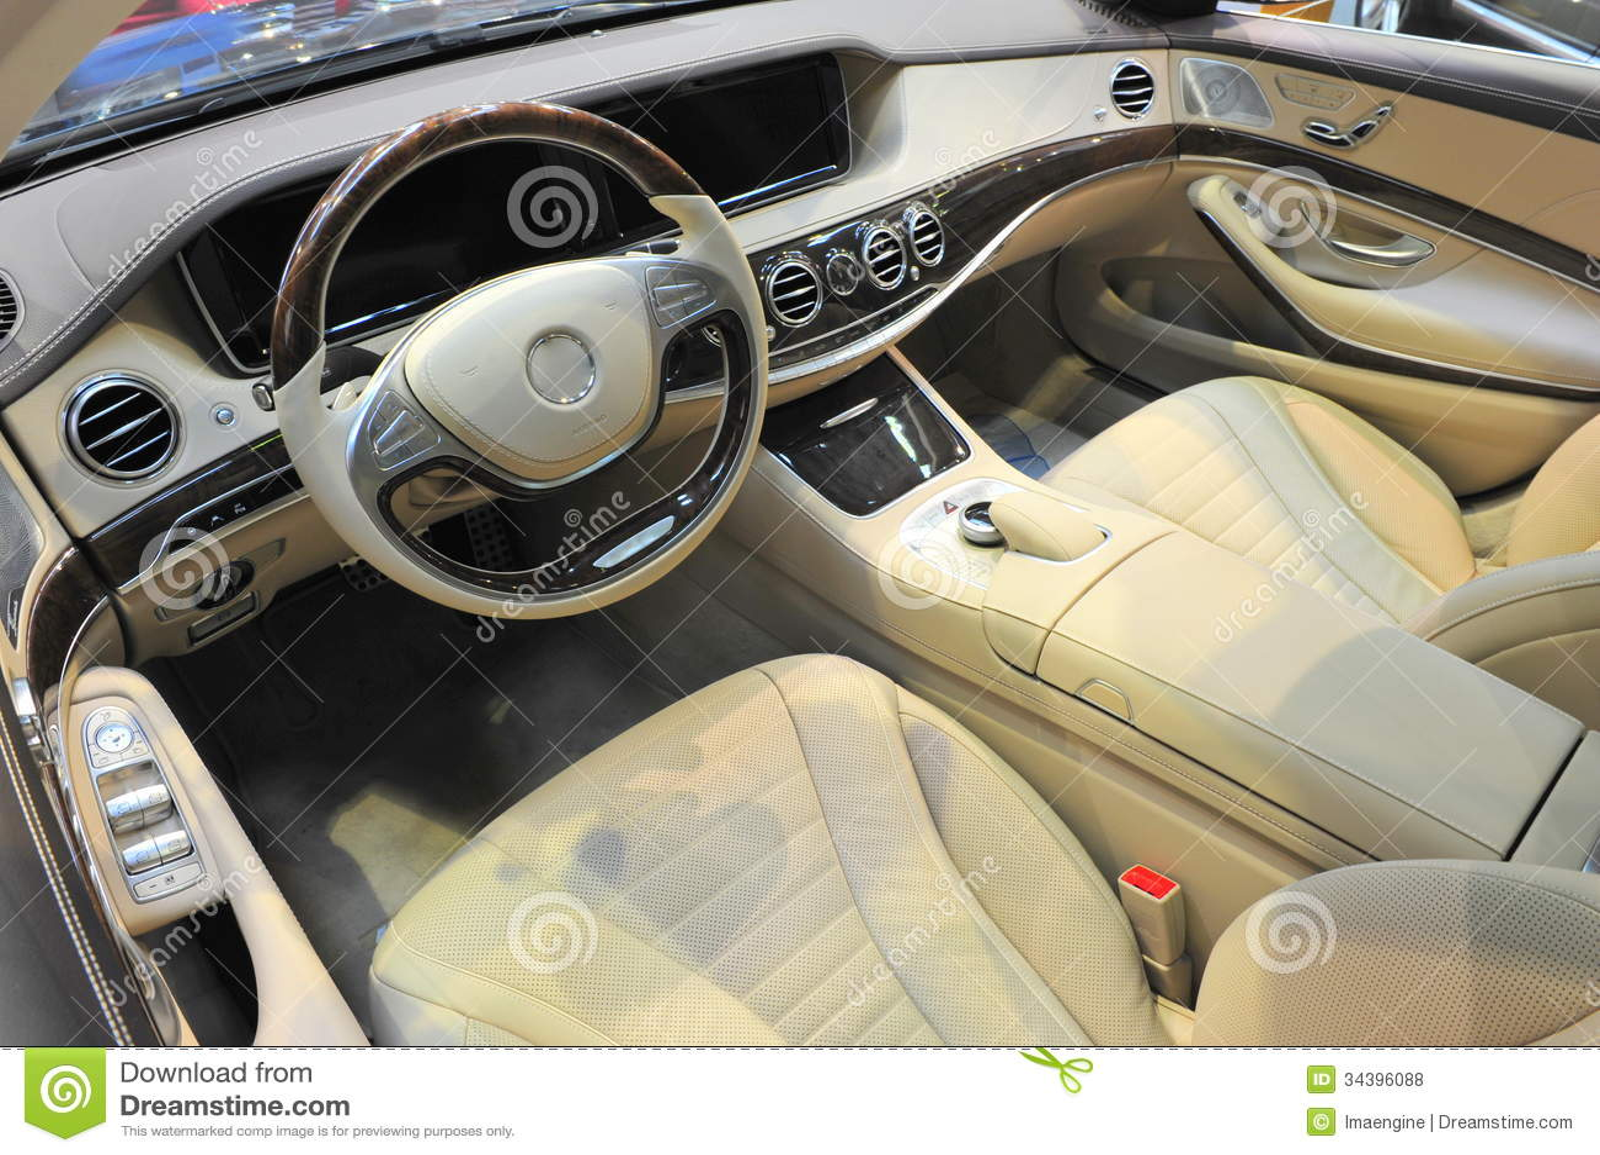 2014 mercedes benz s klasse luxurious interior det royalty free stock photos image 34396088. Black Bedroom Furniture Sets. Home Design Ideas